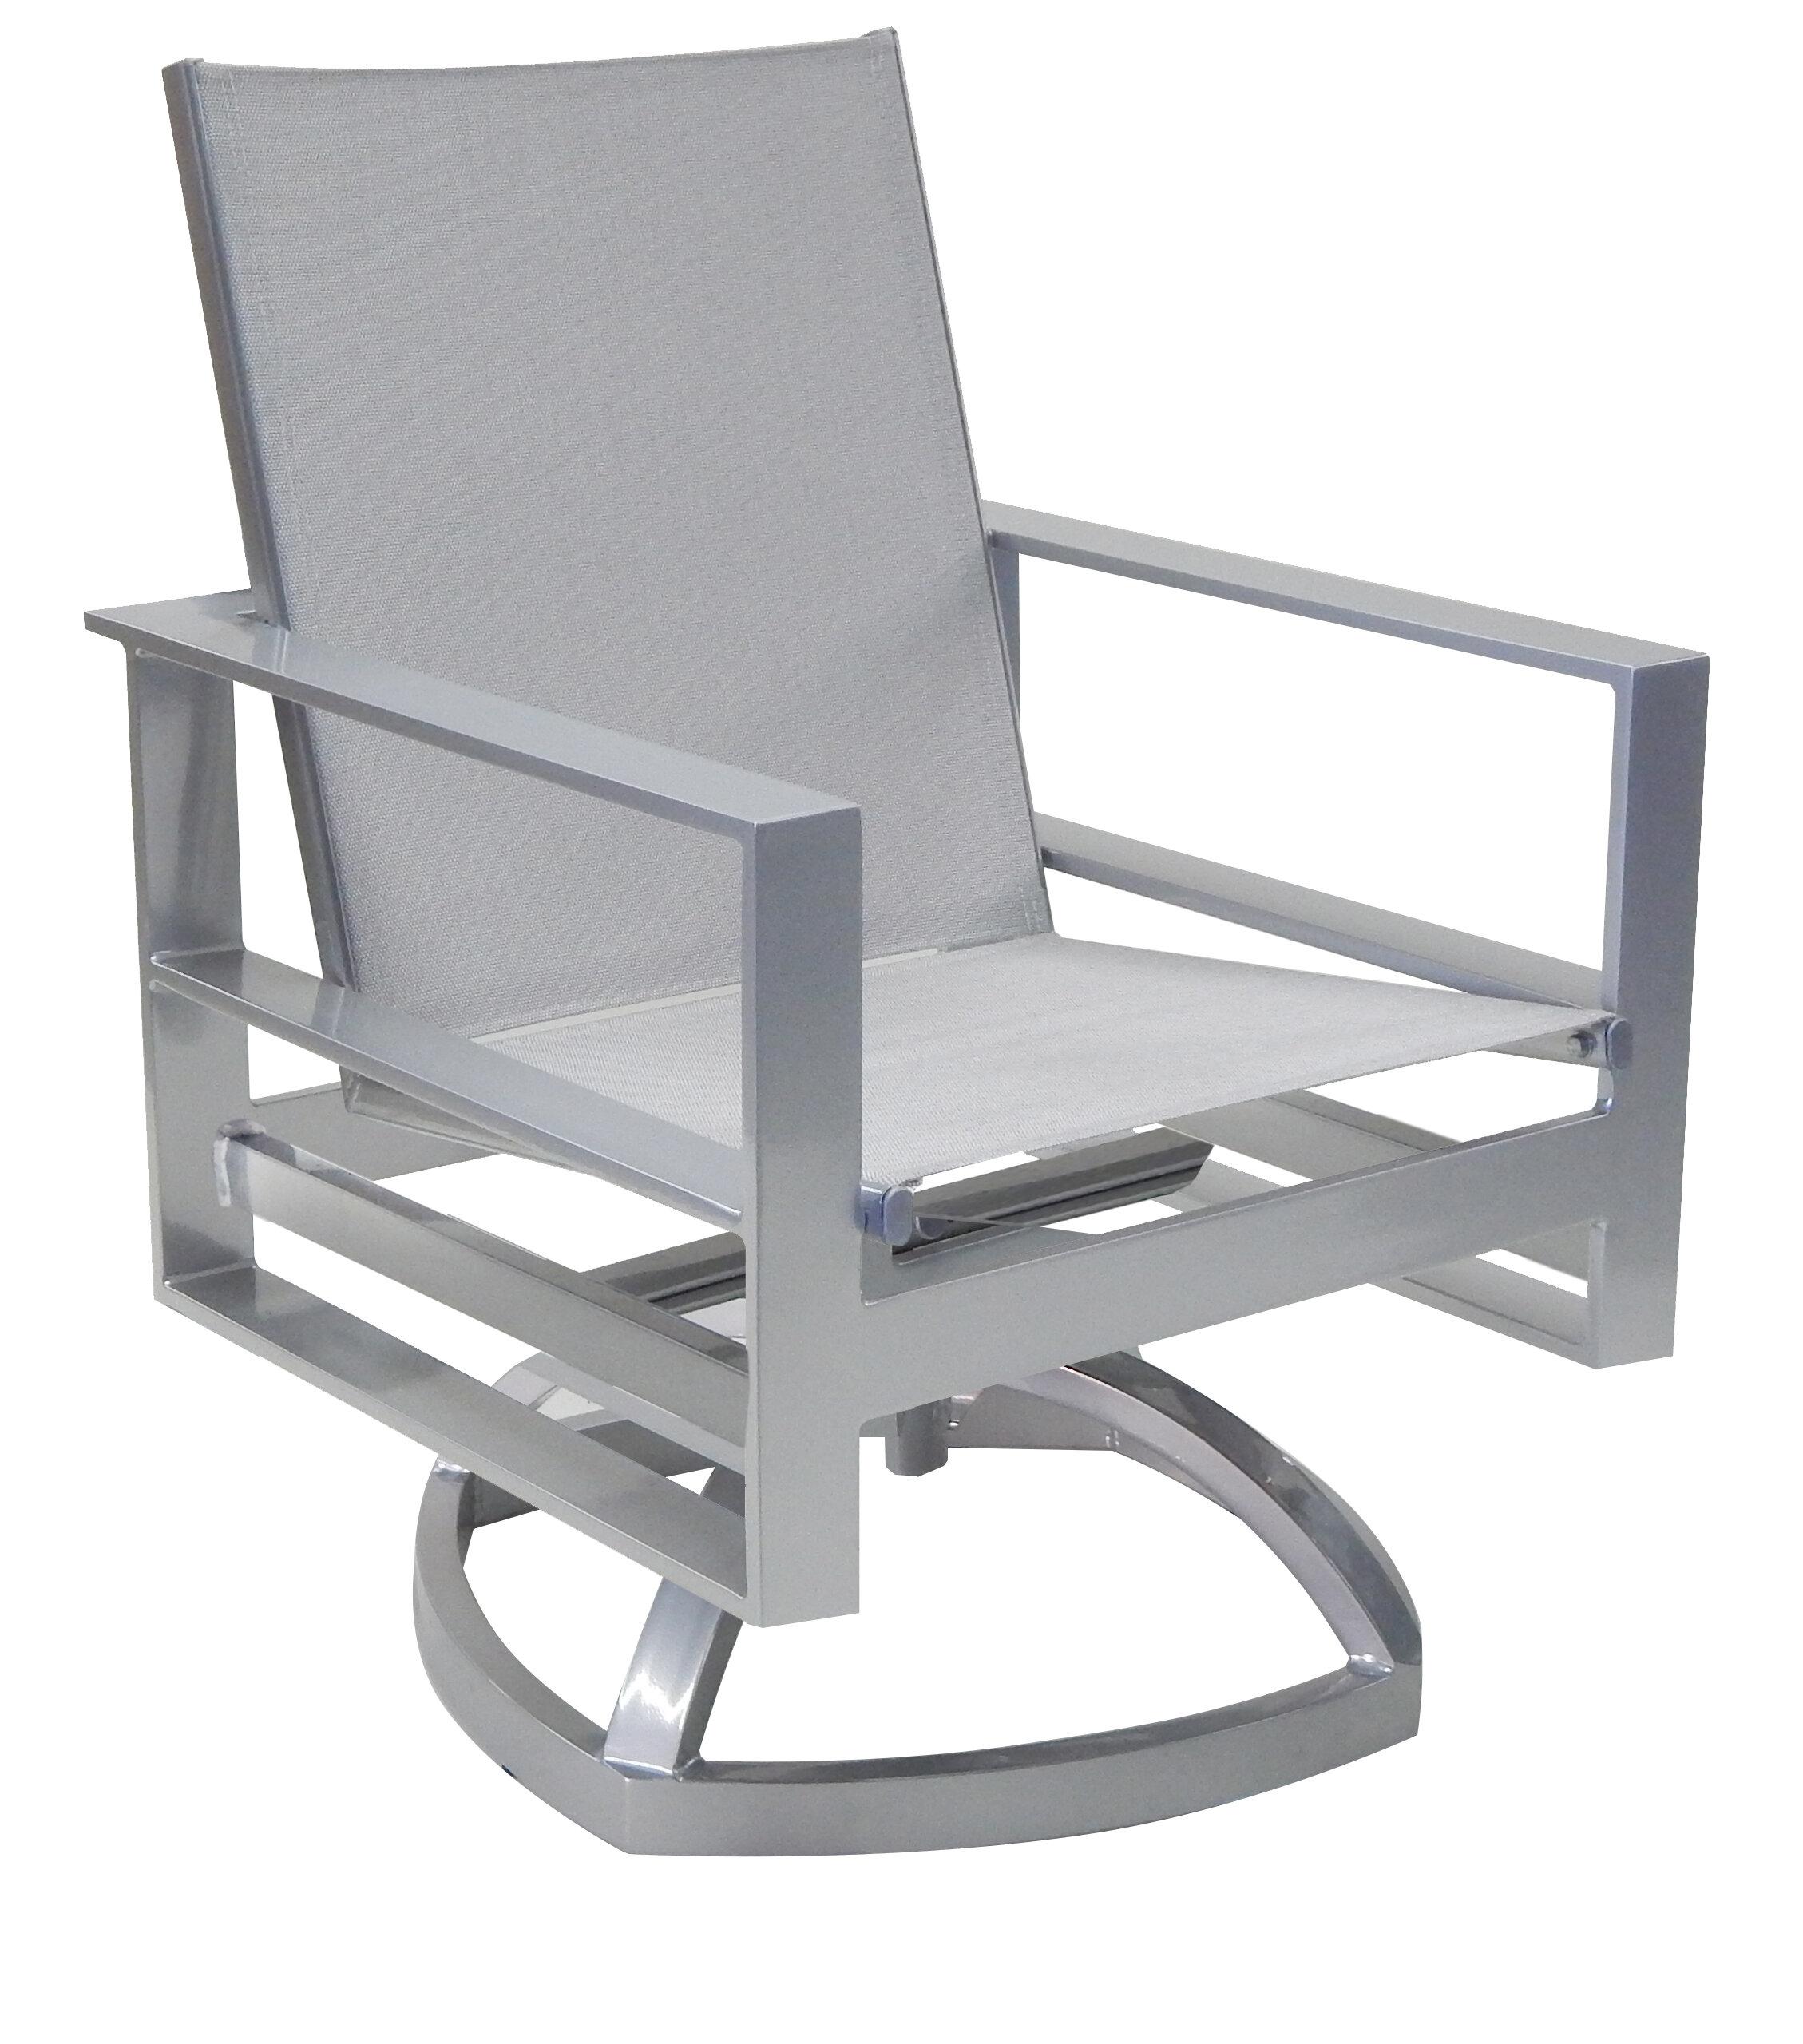 Leona Horizons Sling Swivel Rocking Chair Reviews Wayfair